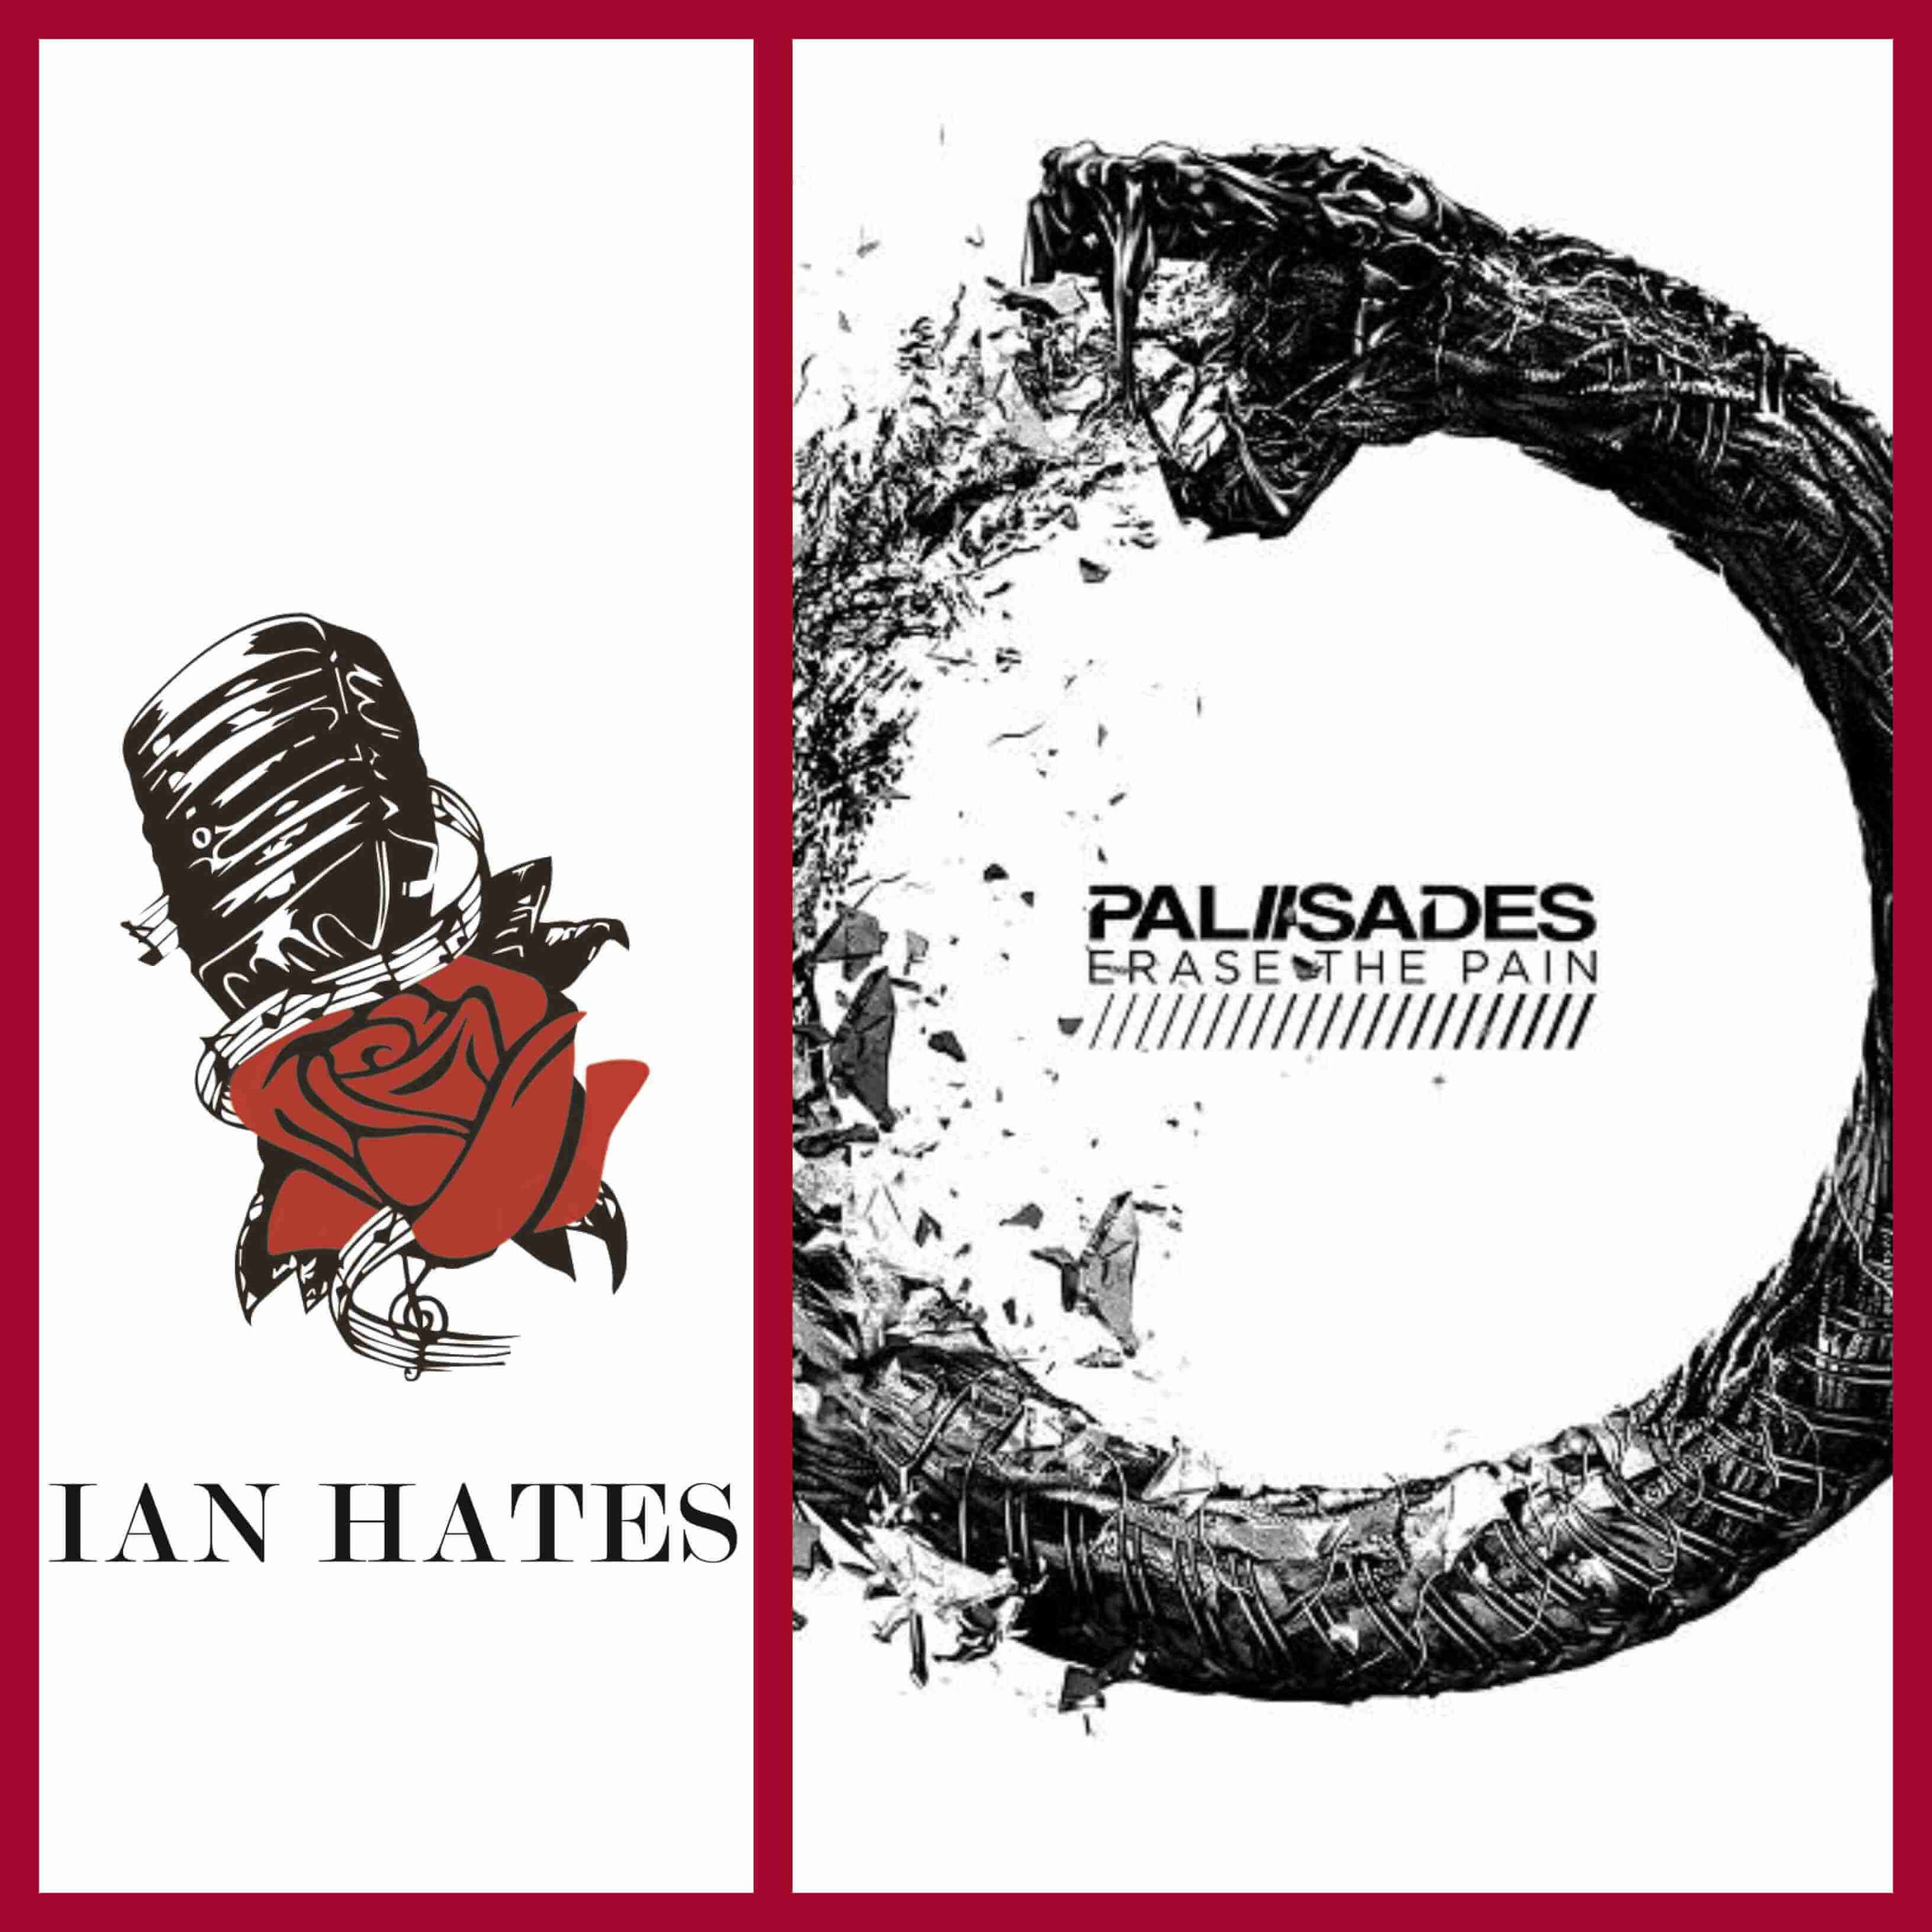 01-03-19 Albums (1).jpg